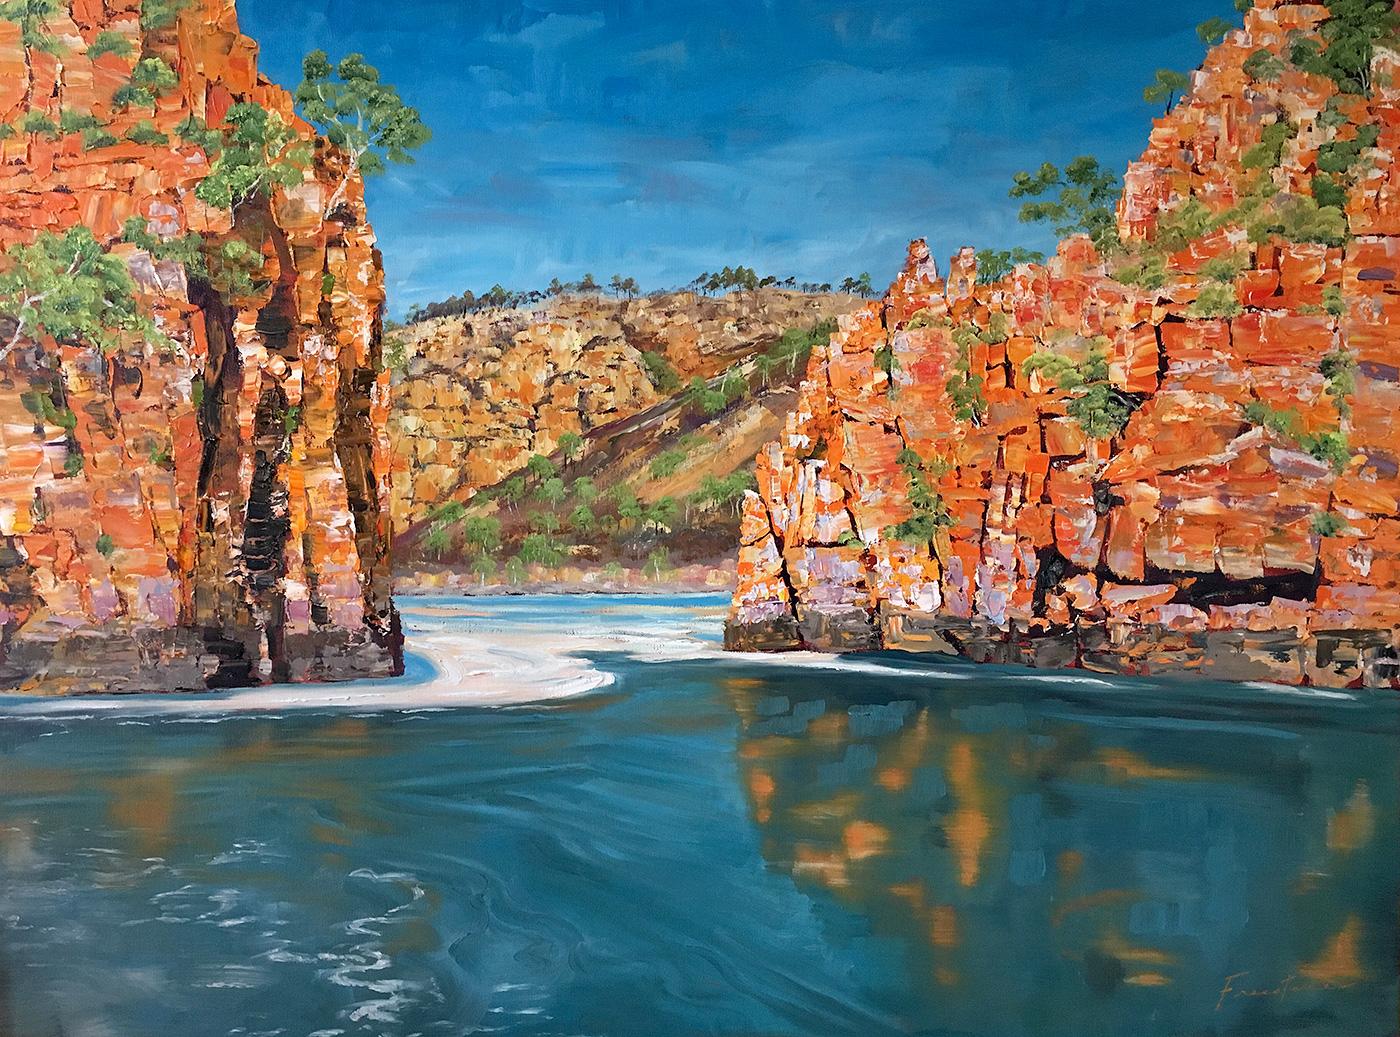 Steve Freestone - 'Horizontal Falls, Buccaneer Archipelago'